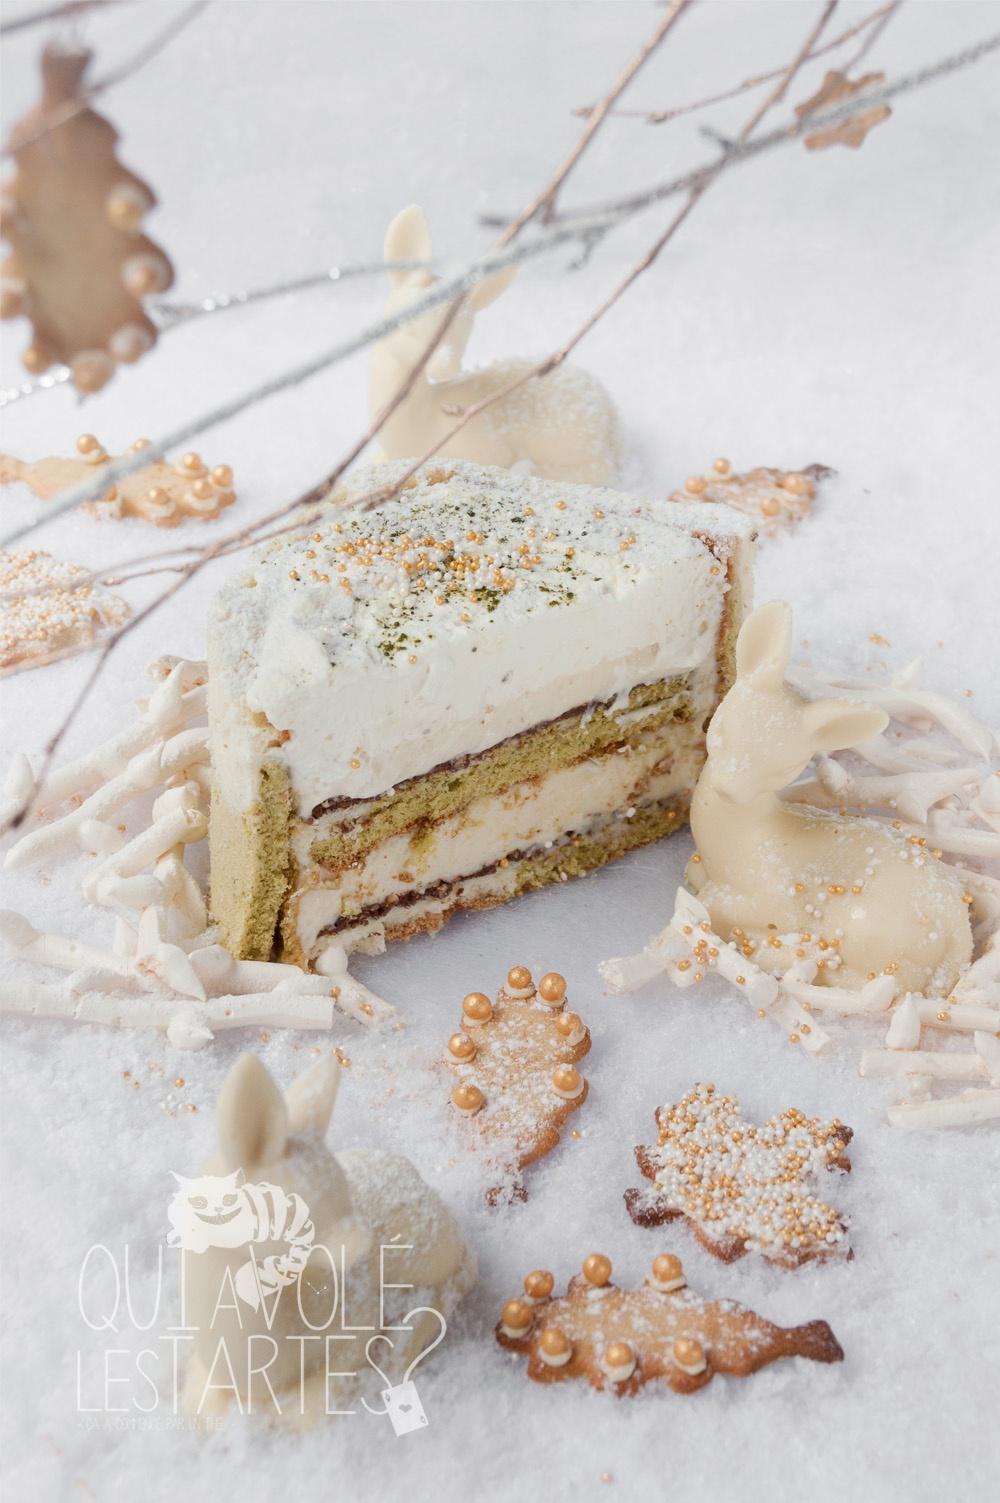 Nara 3 - charlotte sans gluten MatchaYuzu - Studio 2 créaion - Qui a volé les tartes